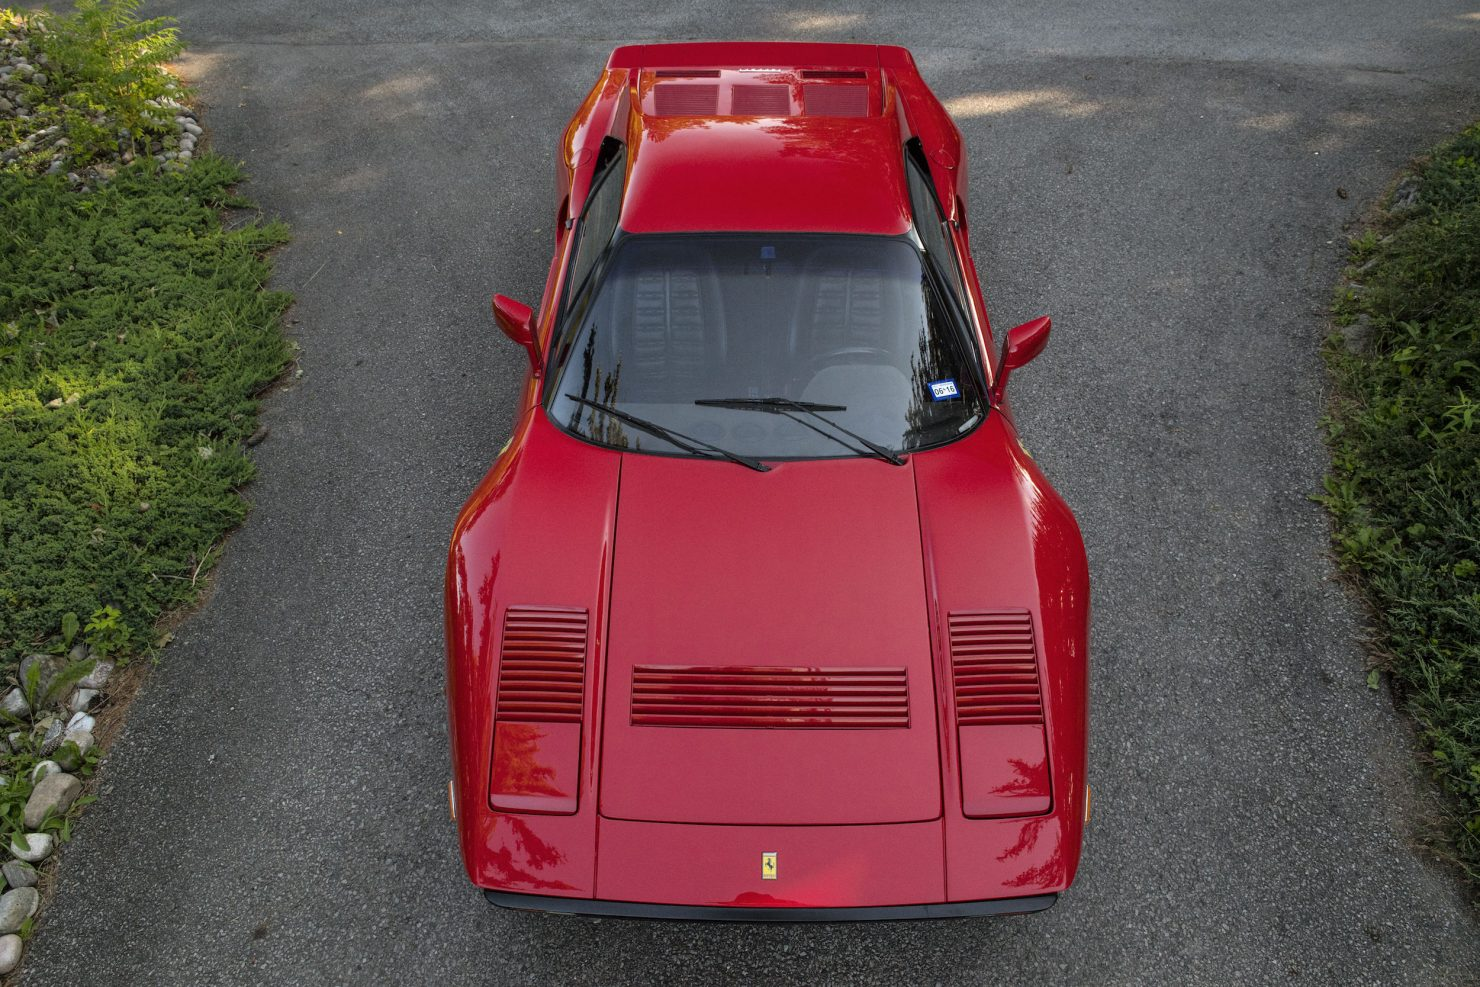 Ferrari 288 GTO 1 1480x987 - 1985 Ferrari 288 GTO